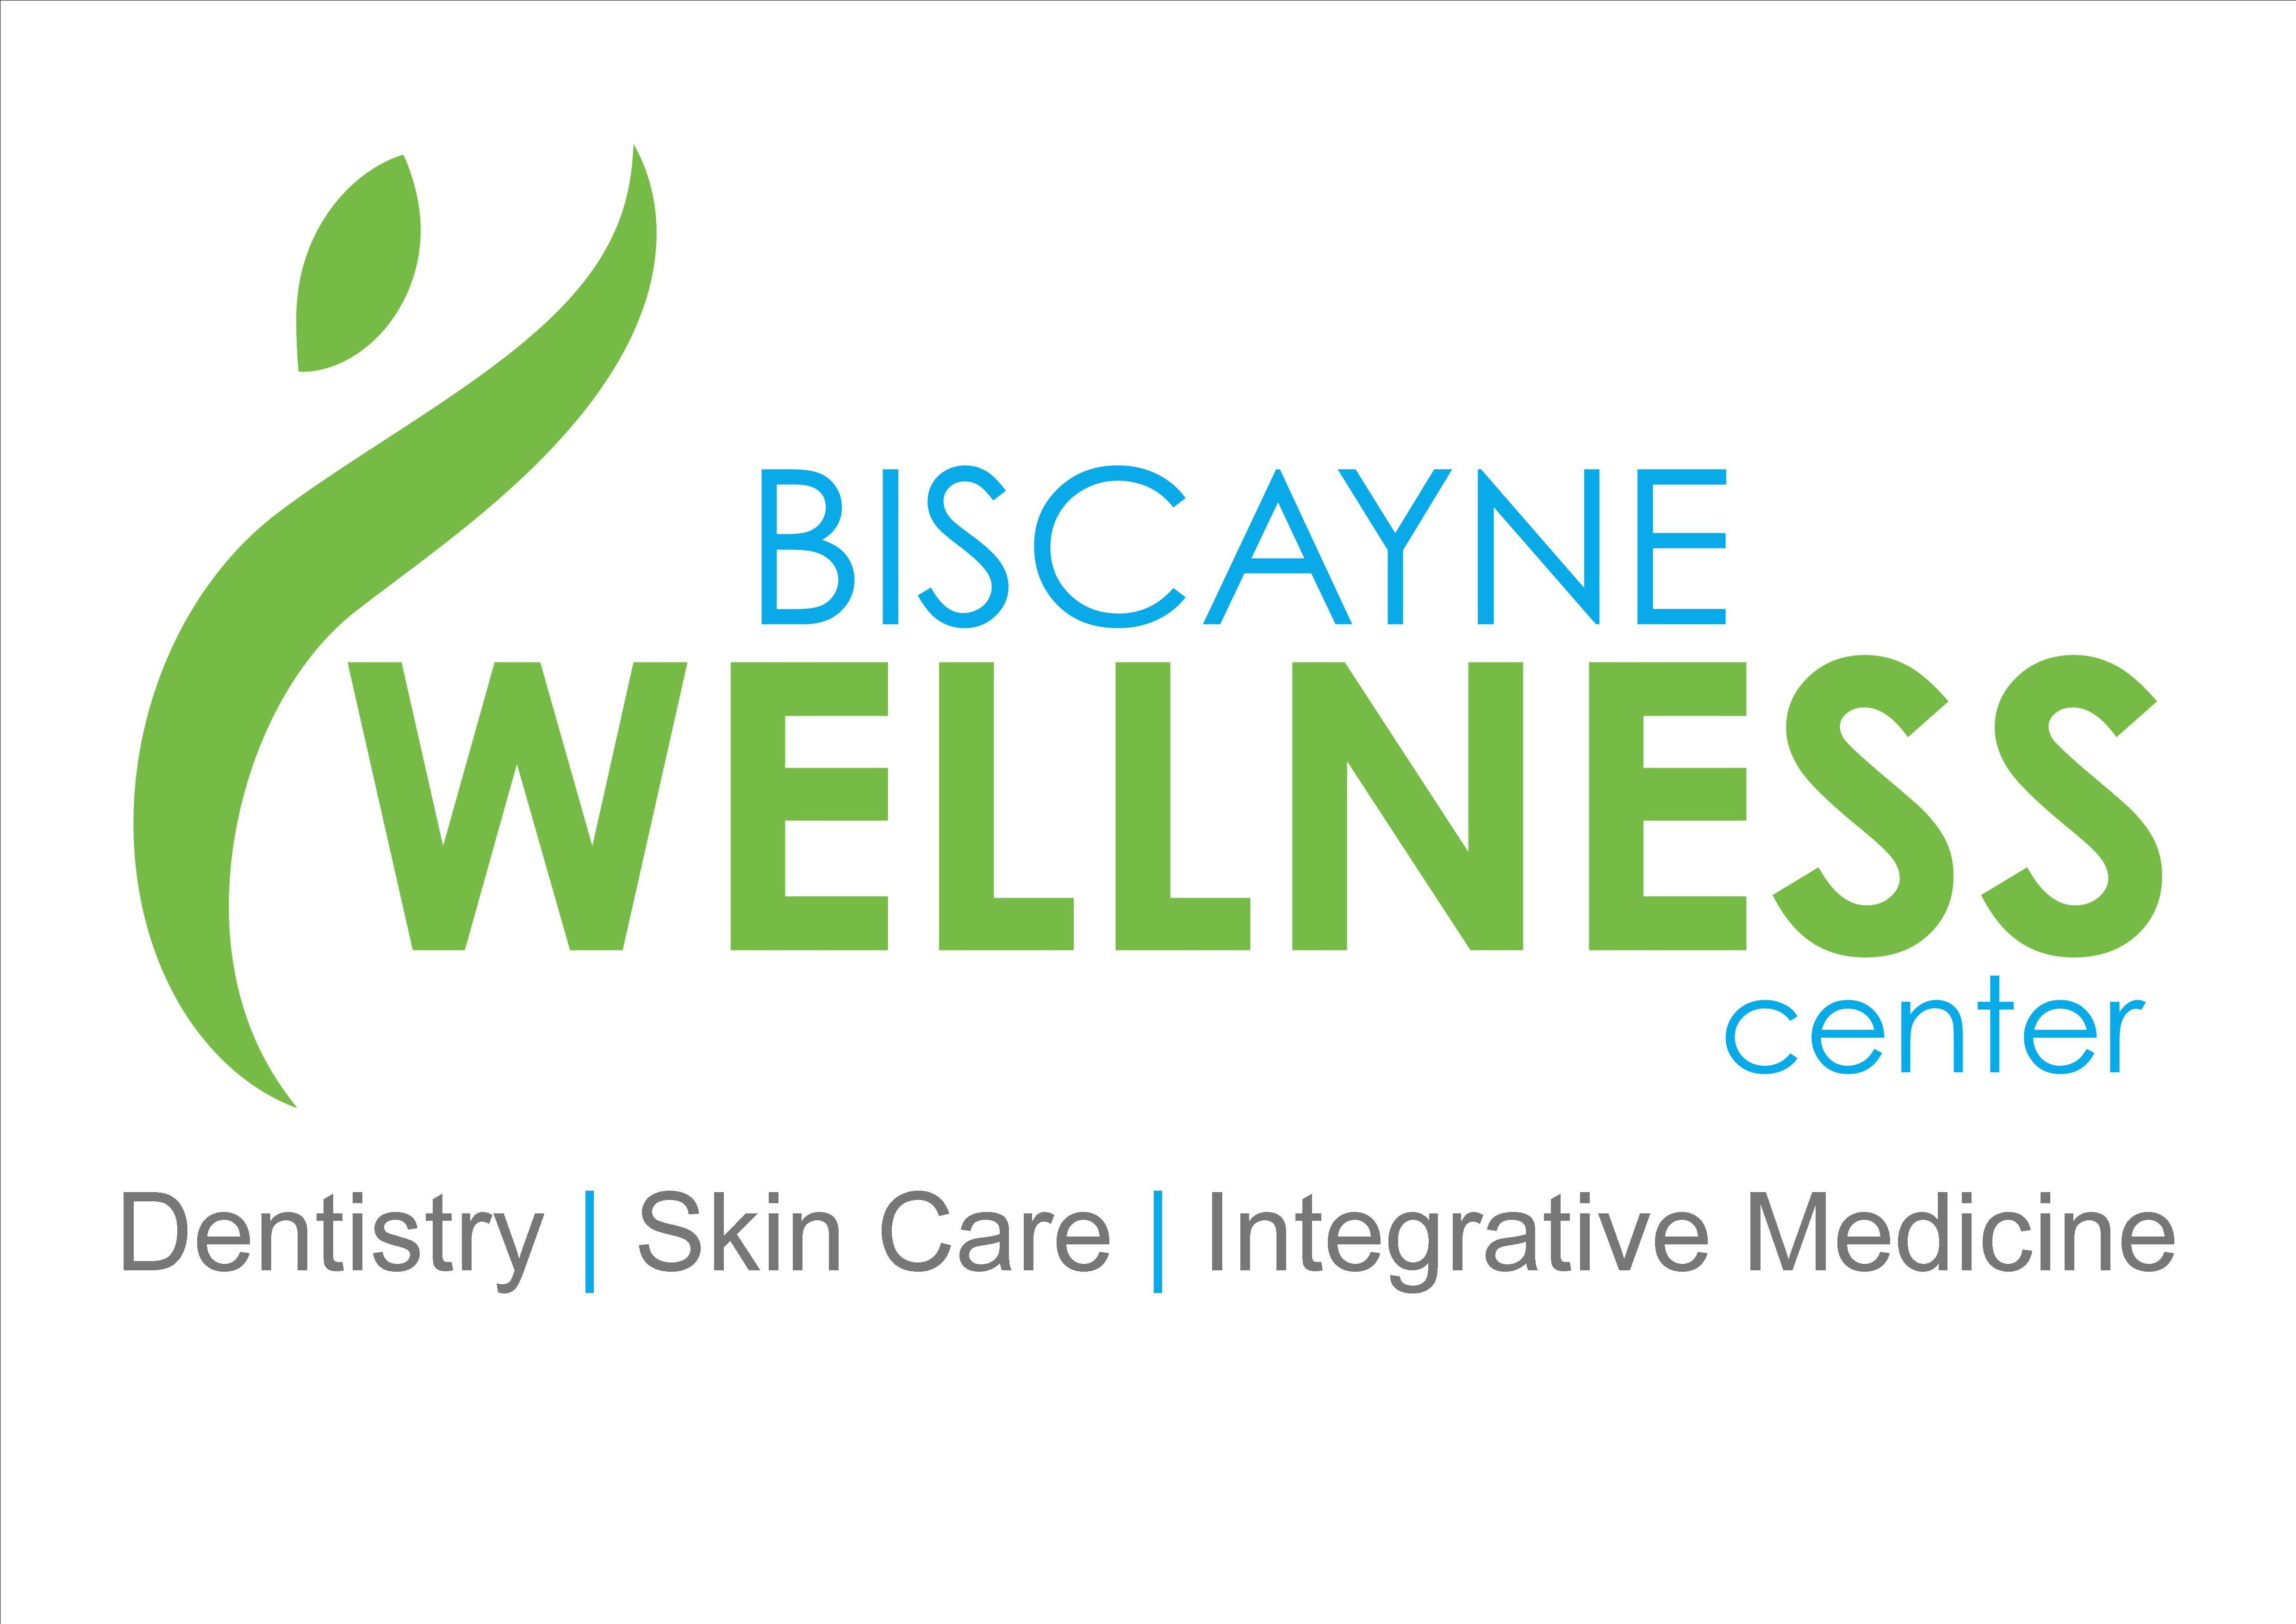 Biscayne Wellness Center